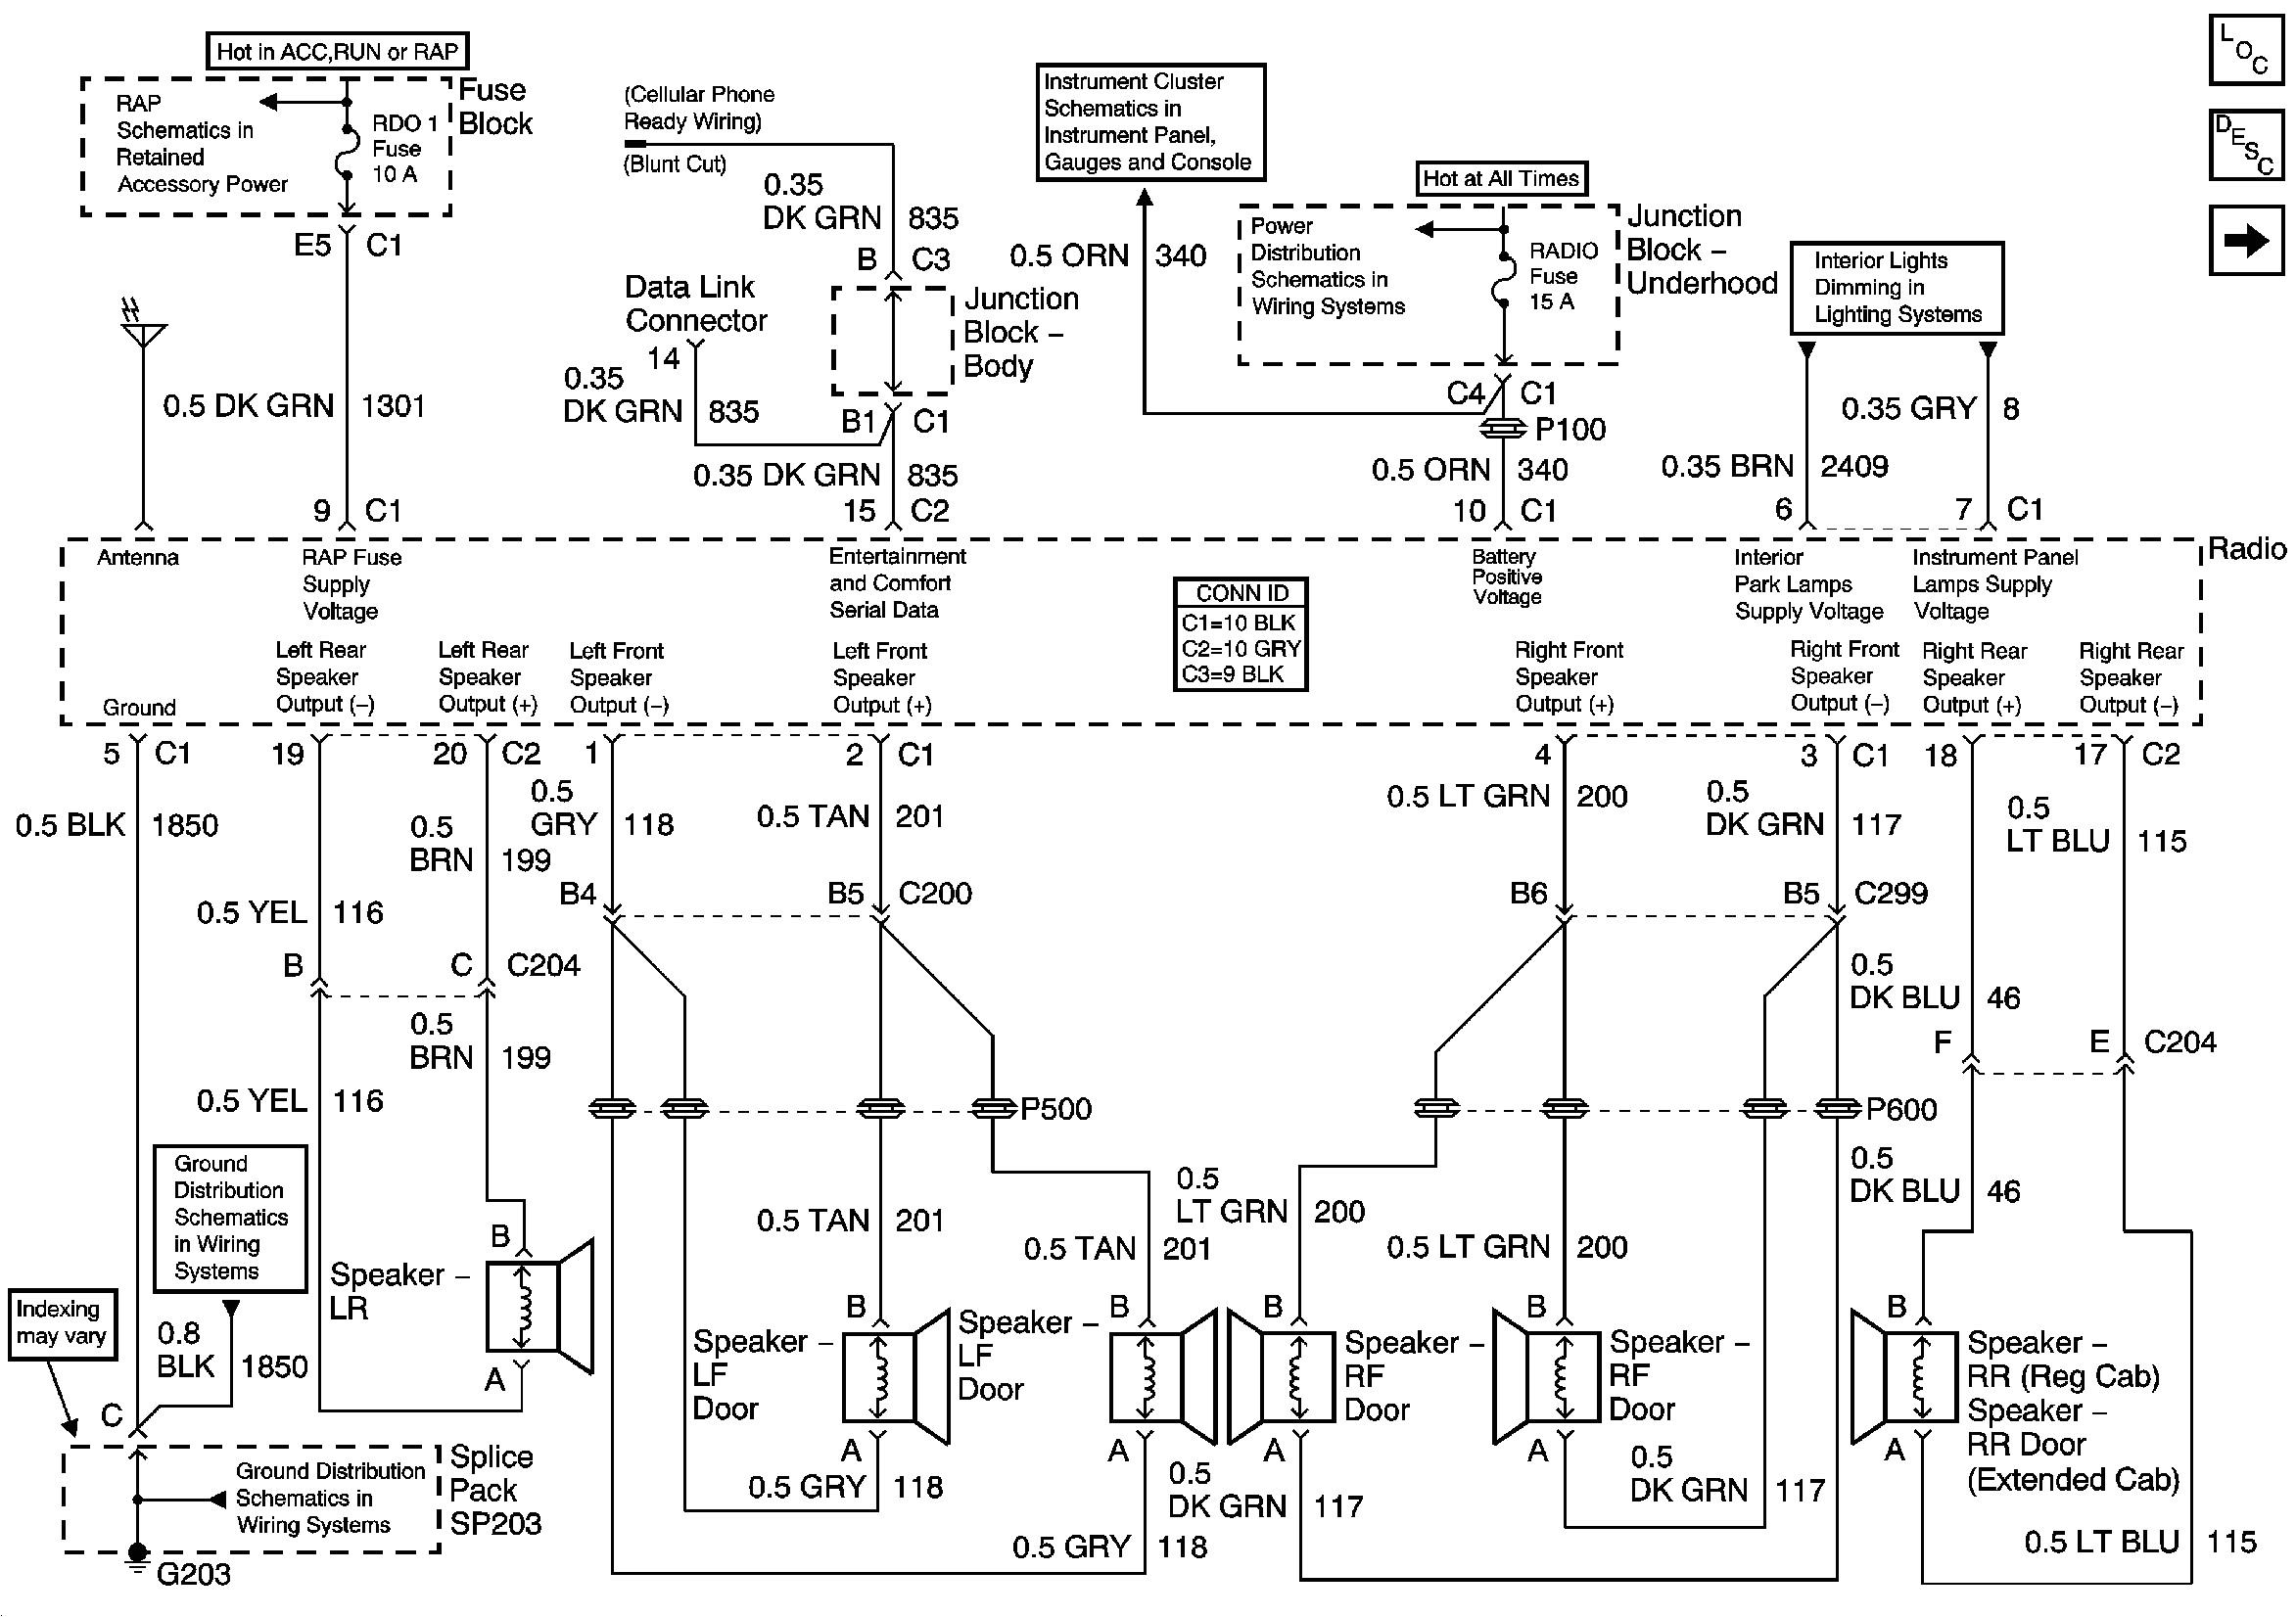 2003 gmc yukon bose radio wiring diagram 2001 chevy impala with and 2006 stereo to 2004 silverado at tahoe gif